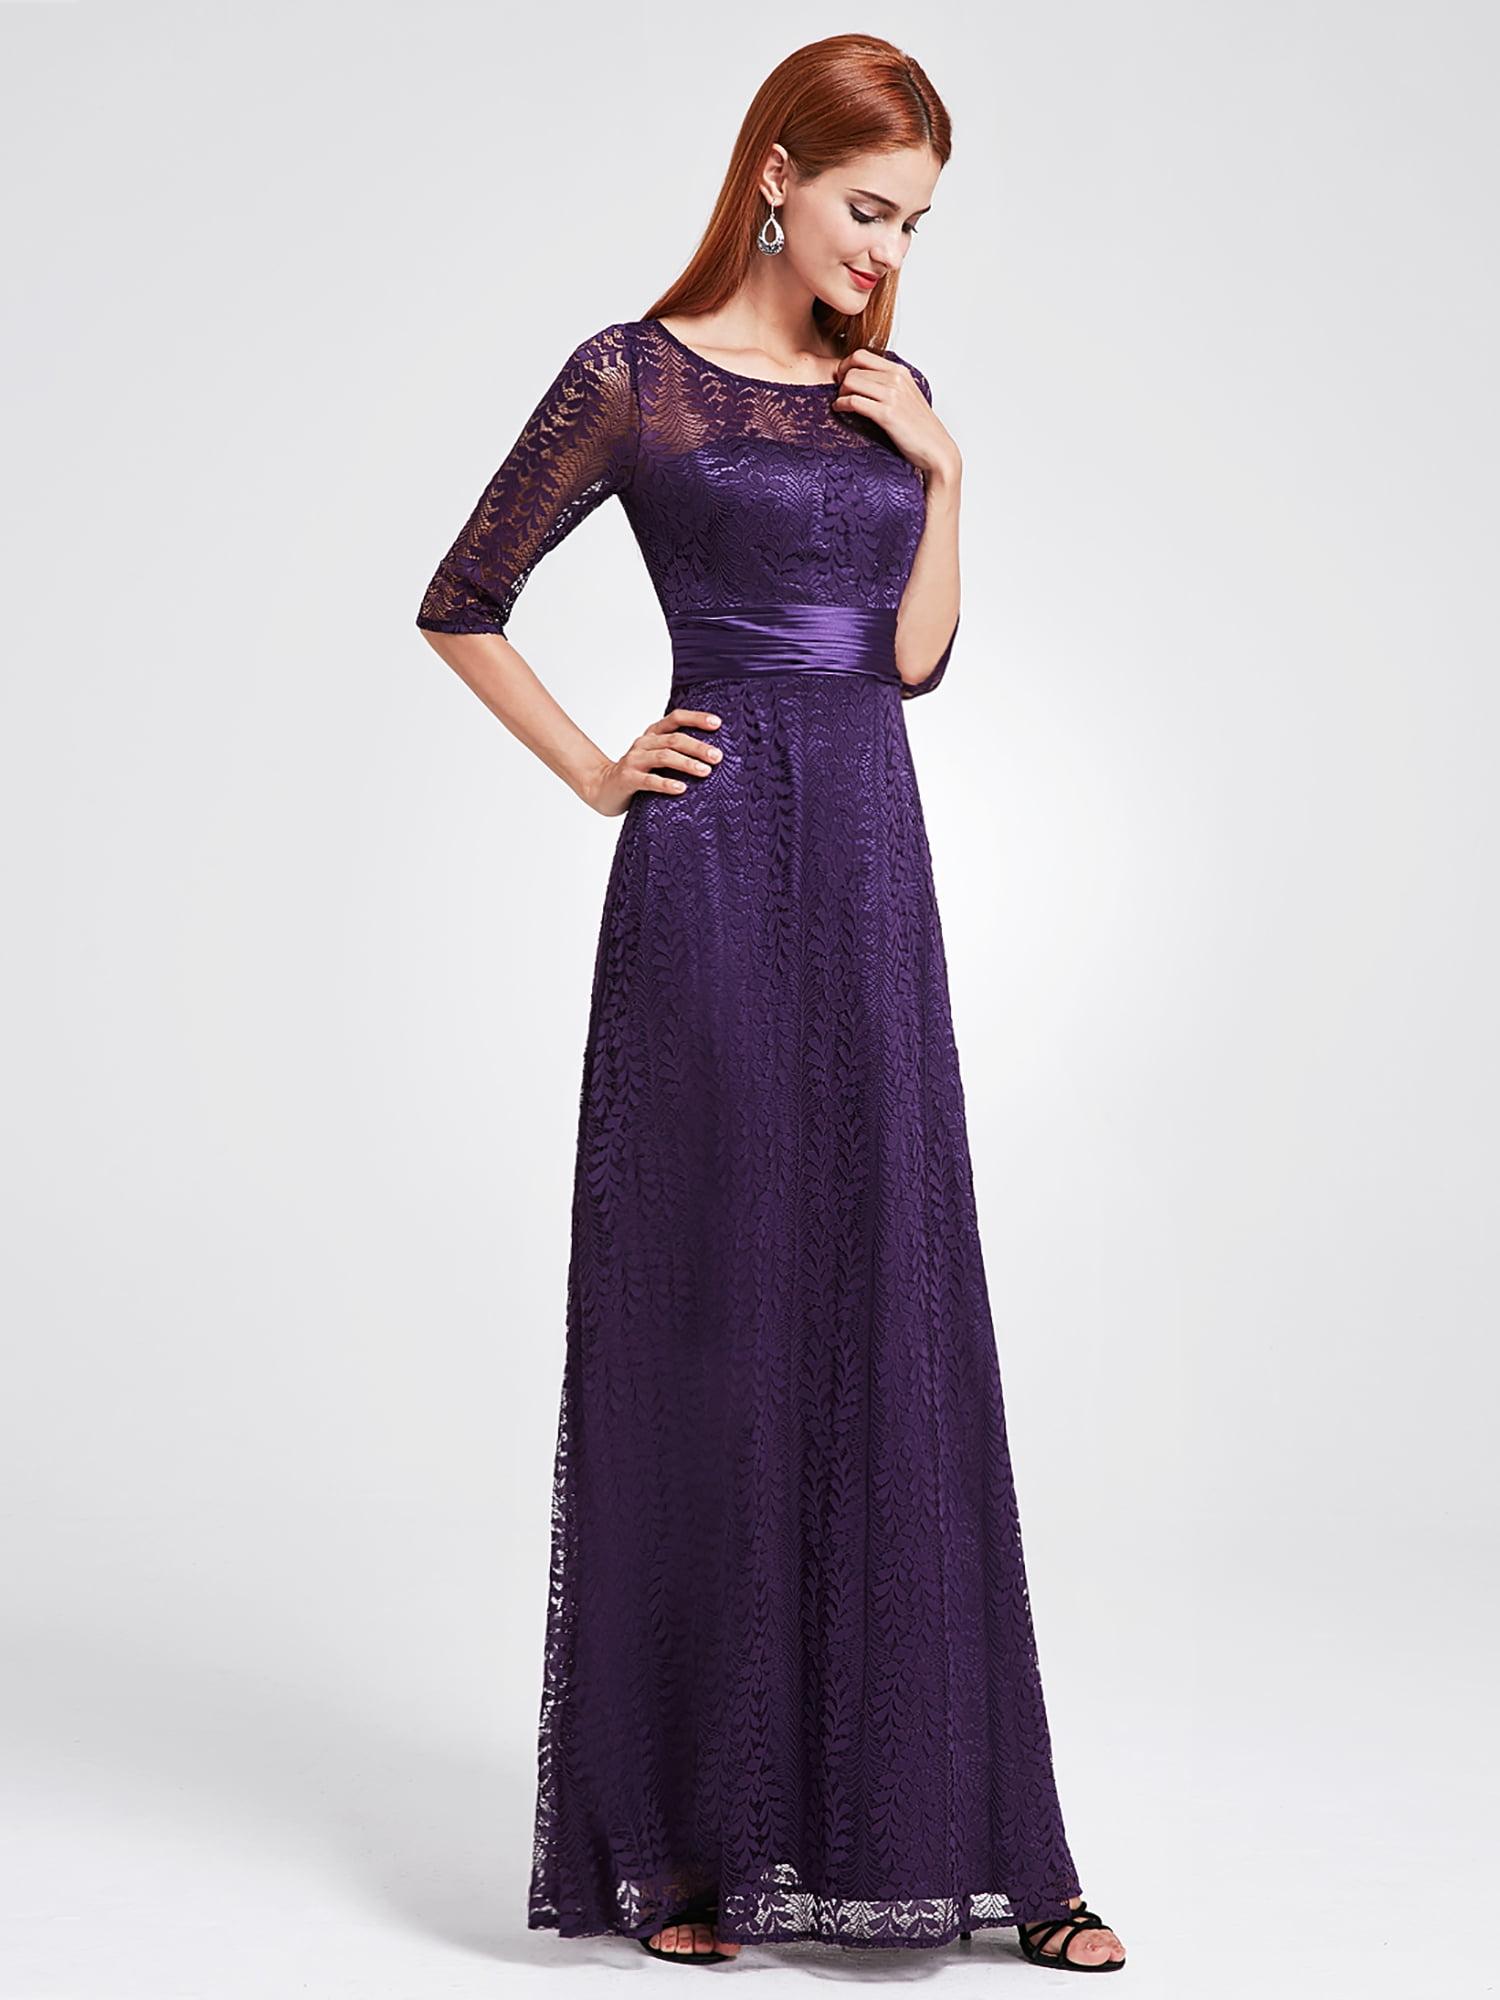 d7d828687c1 Ever-pretty - Ever-Pretty Women s Elegant Long A-Line Floral Lace Formal  Evening Wedding Guest Mother of the Bride Dresses 08878 for Women Purple 4  US ...